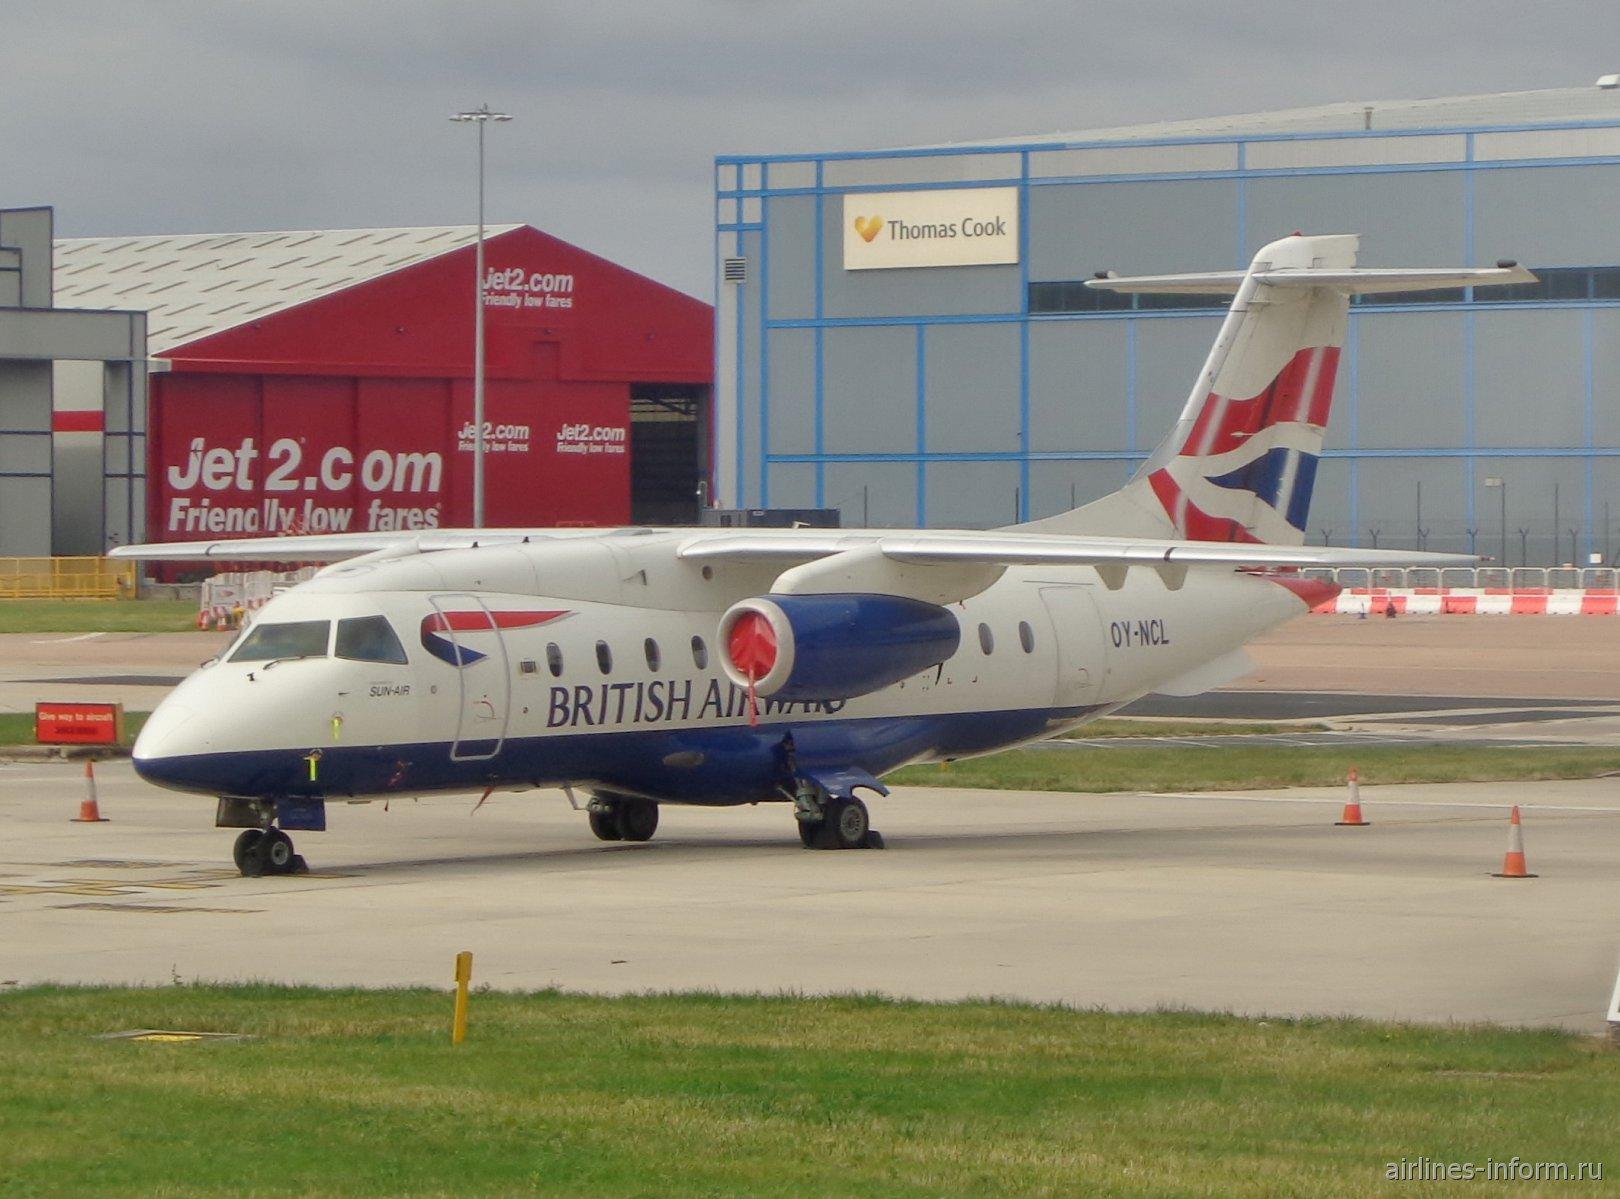 Самолет Dornier Do-328jet OY-NCL авиакомпании Sun-Air в аэропорту Манчестер